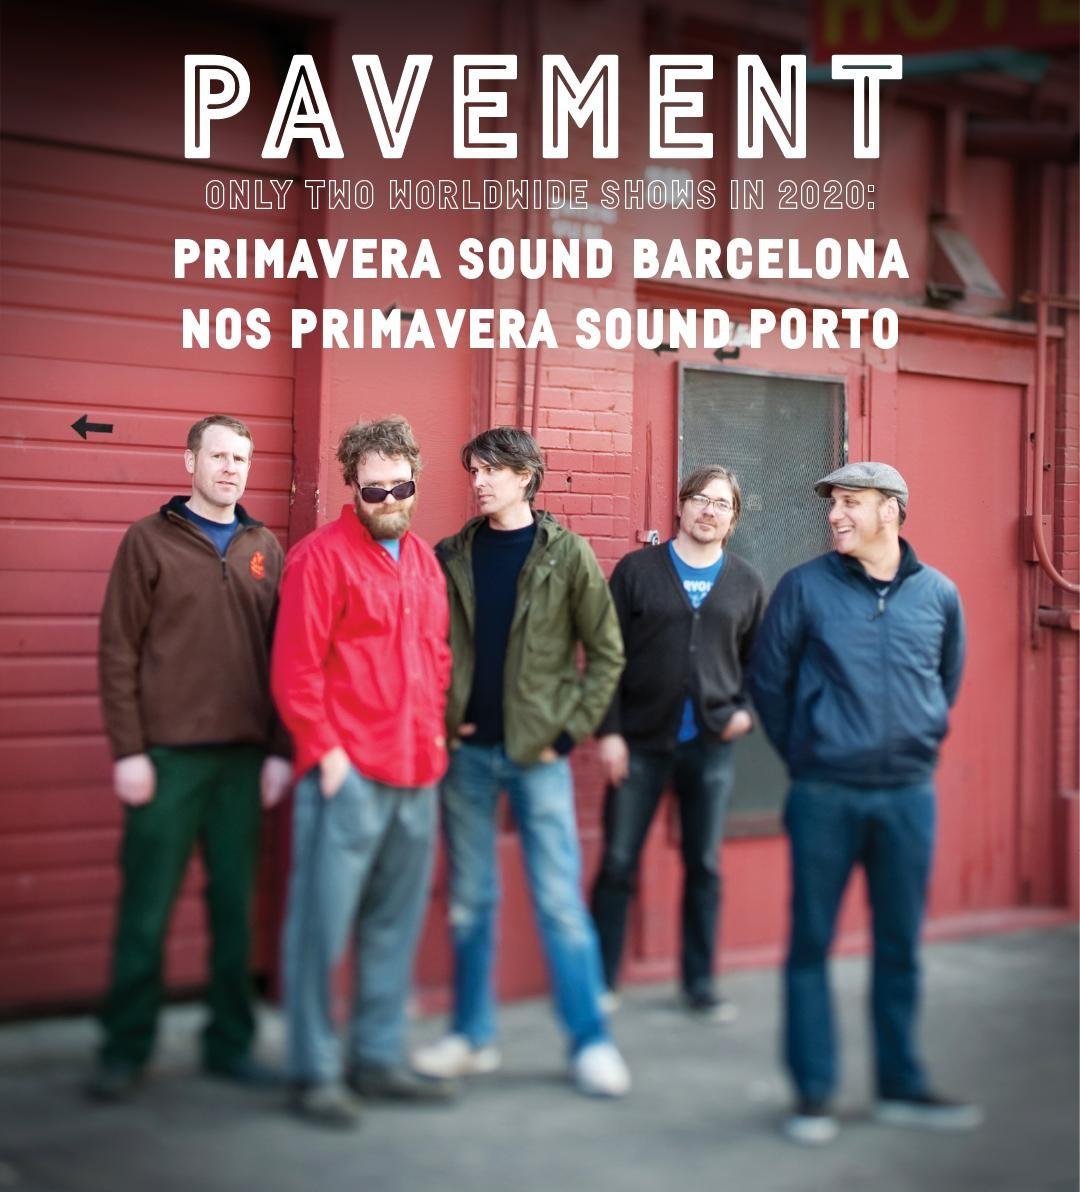 Stereogum Best Albums 2020 Pavement Reuniting For Primavera 2020   Stereogum